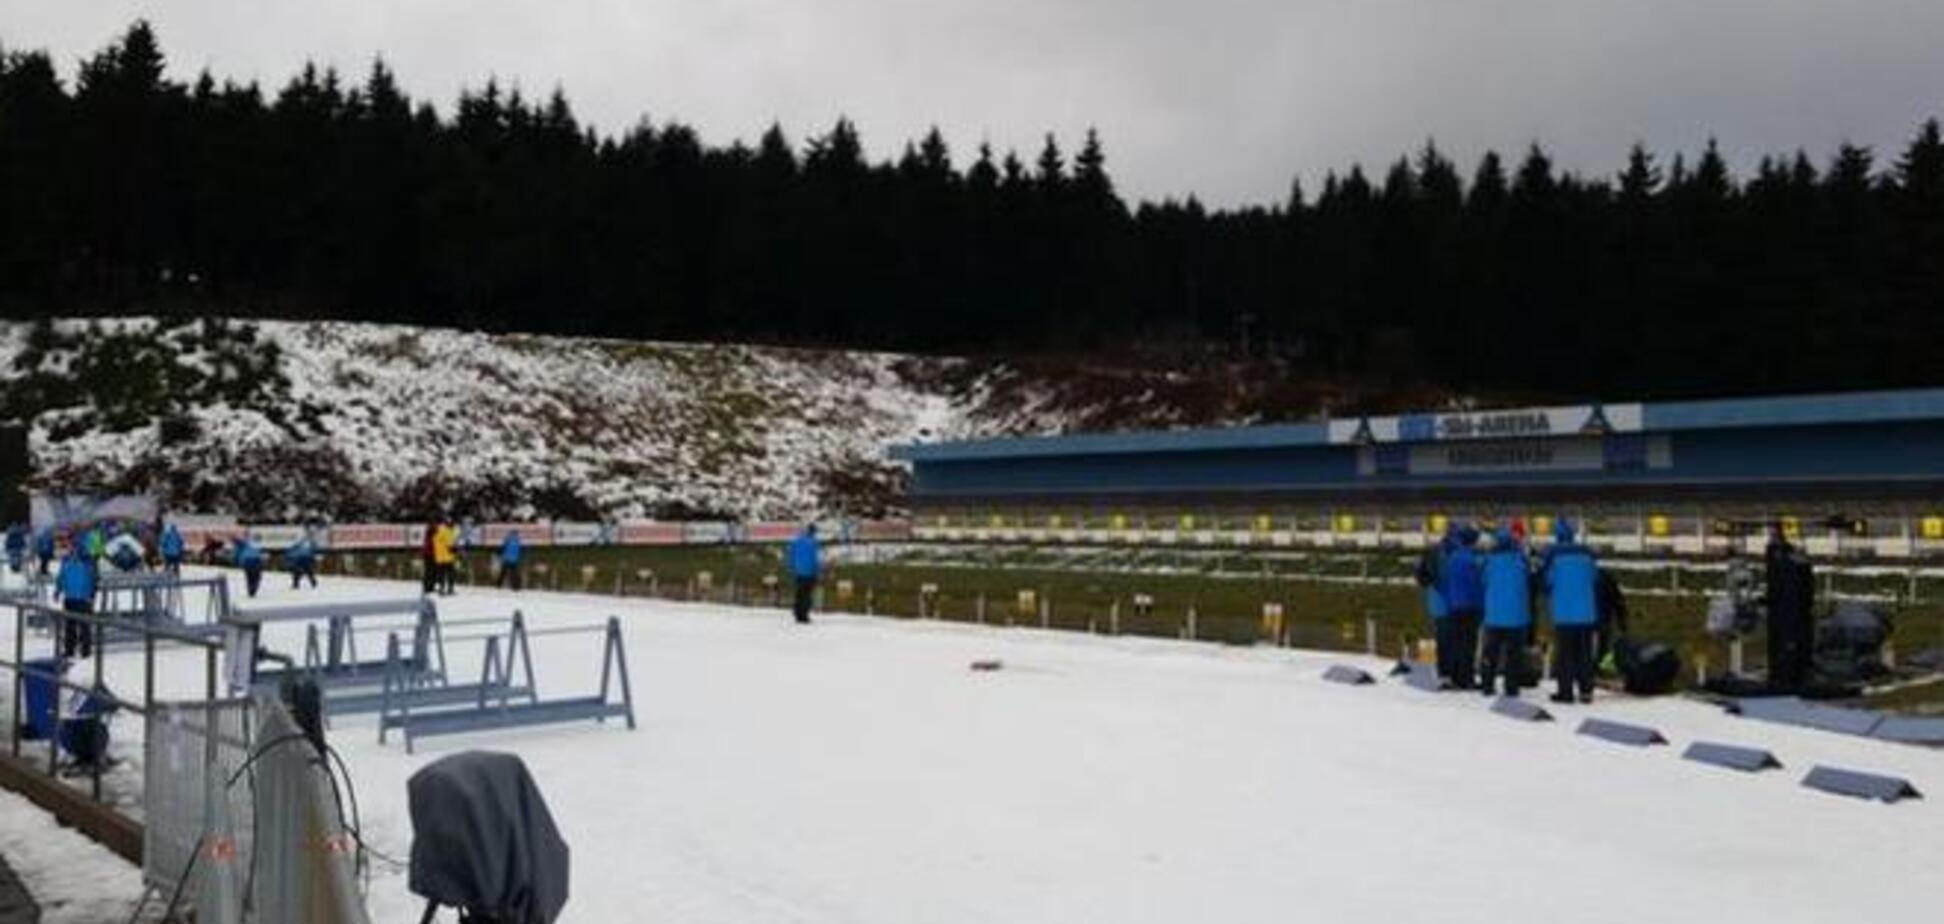 Погода сорвала старт мужского спринта на Кубке мира по биатлону